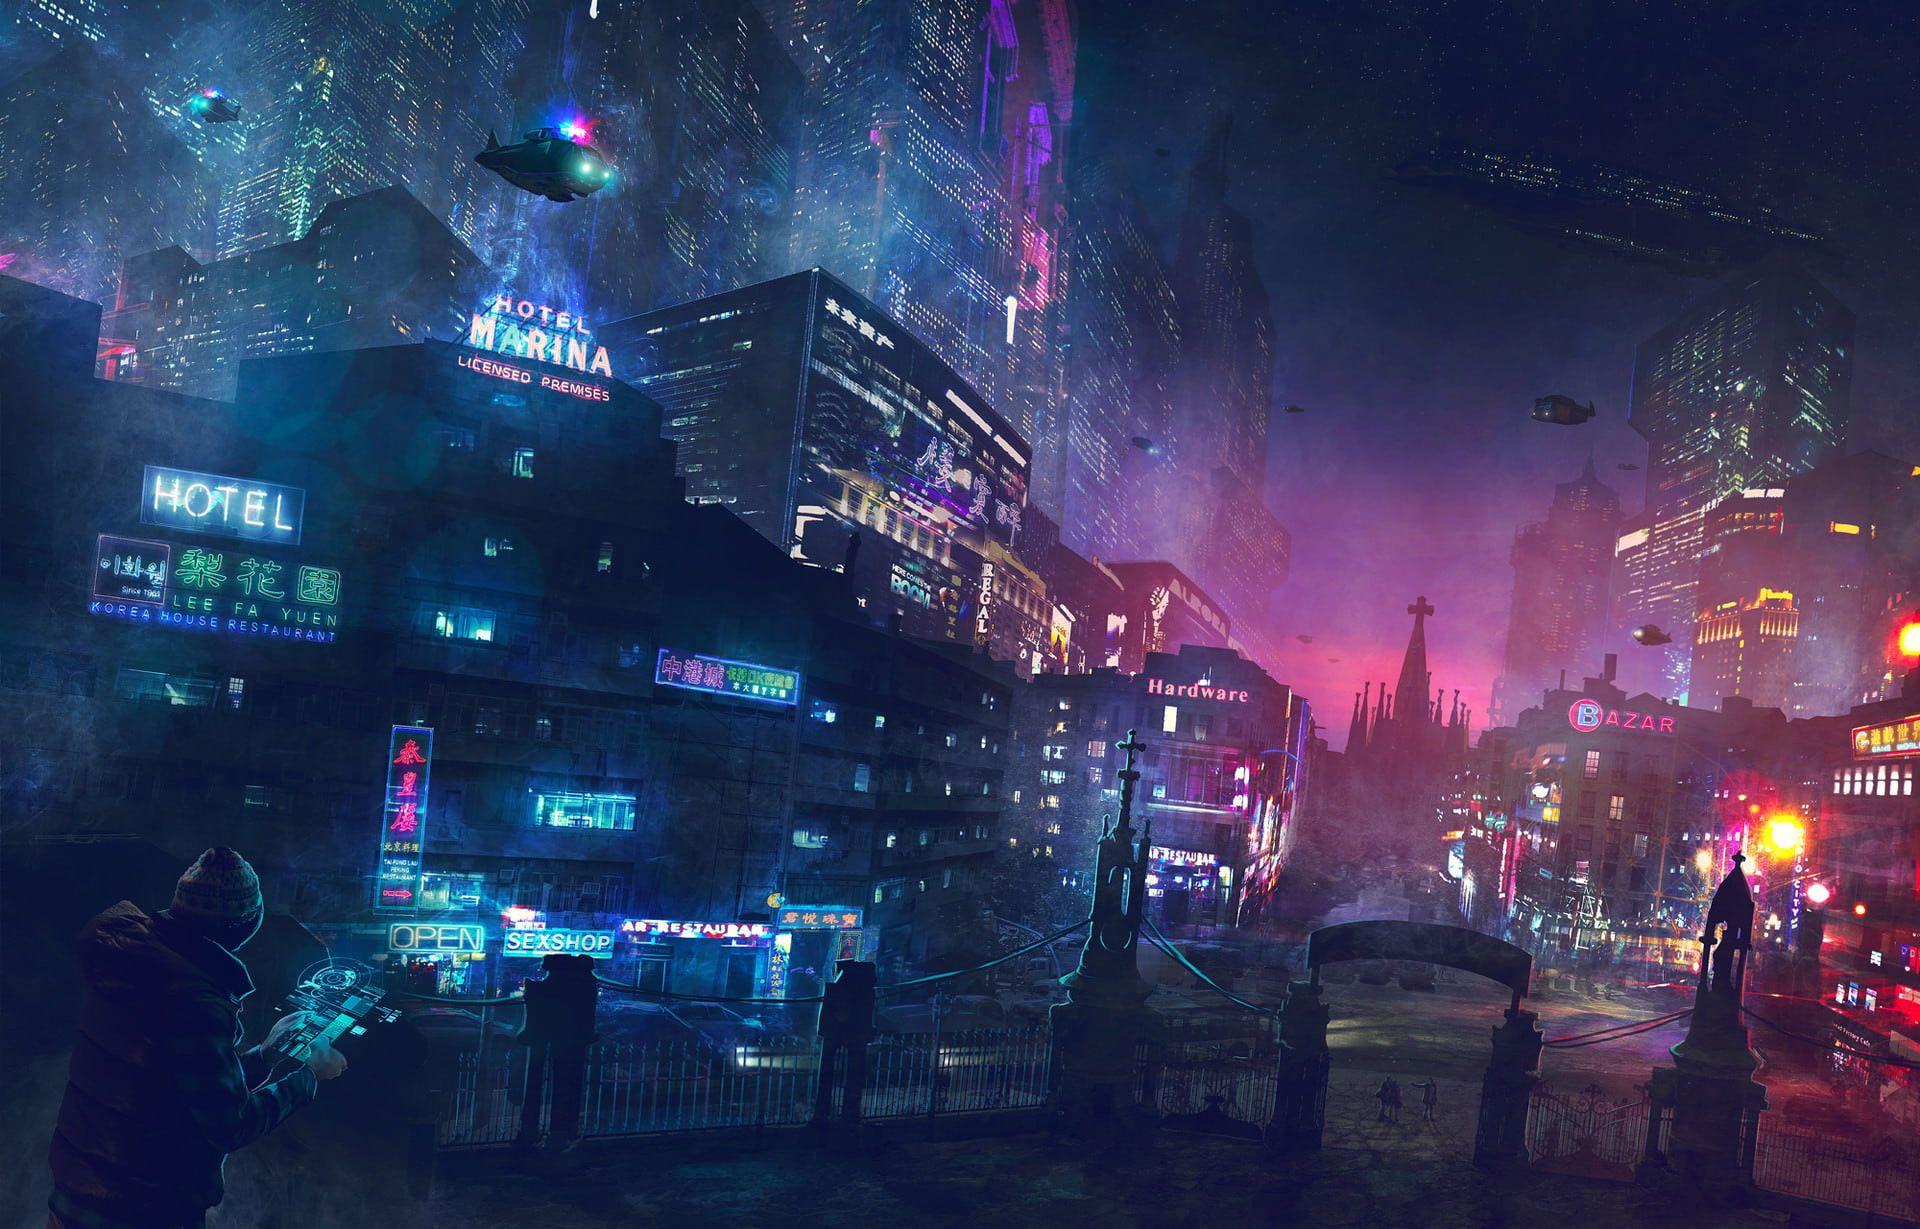 Futuristic Wallpaper City Science Fiction Cyberpunk Neon